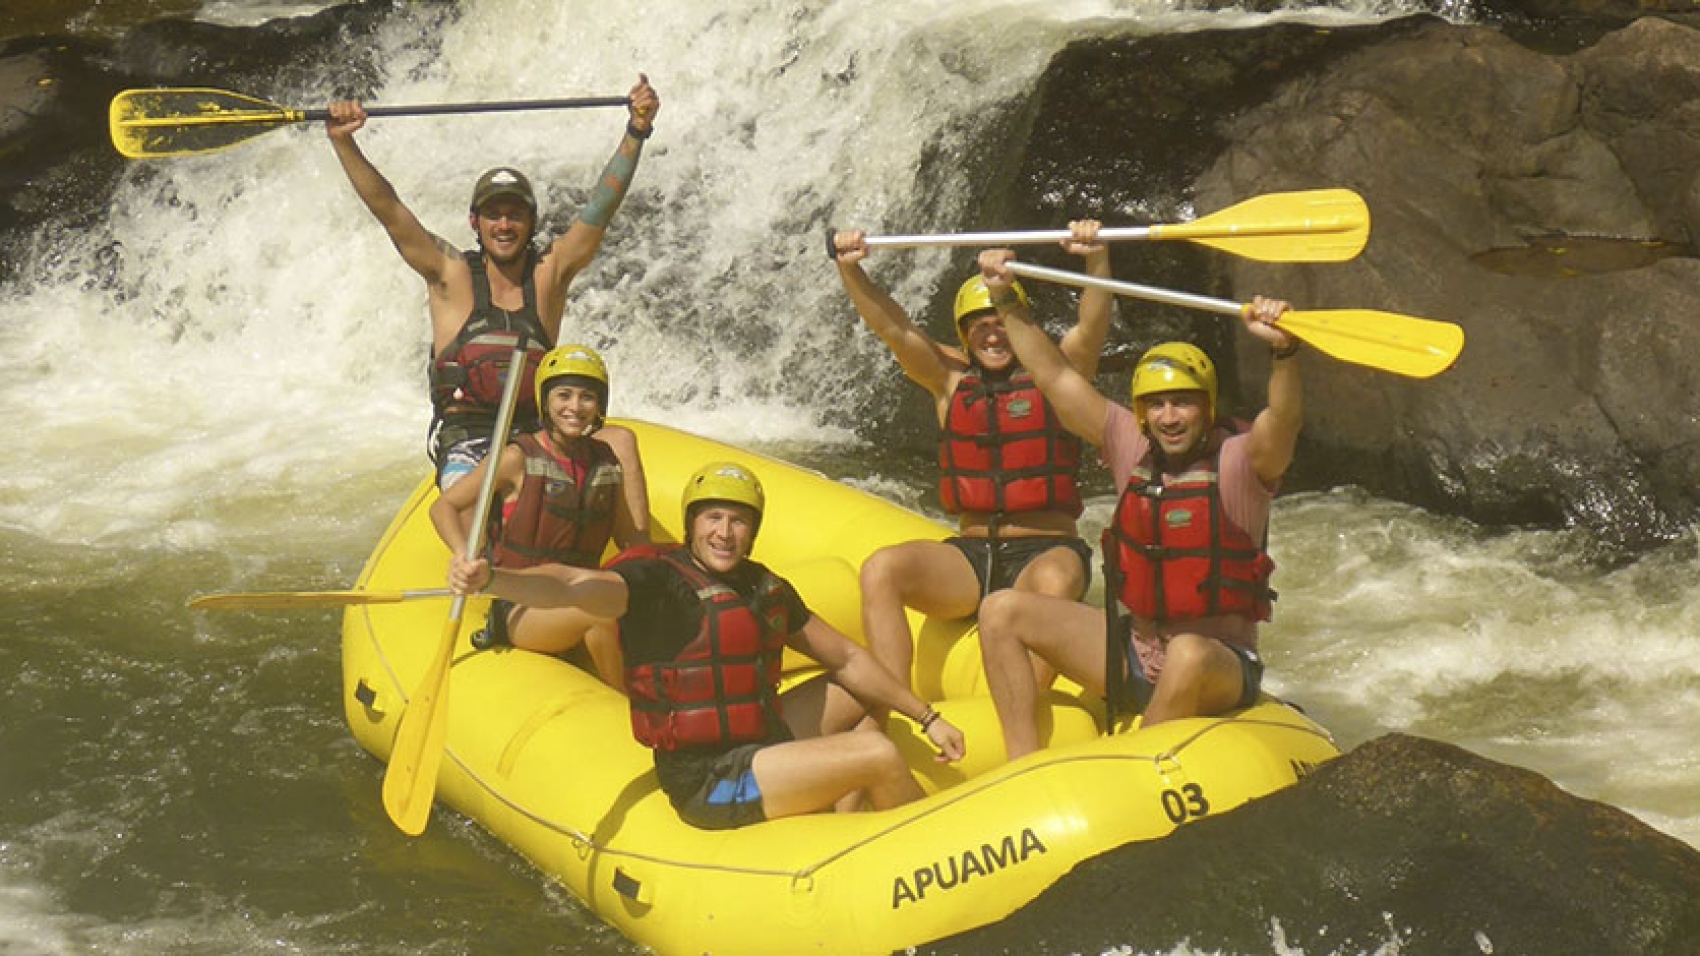 aventuras ao ar livre rafting